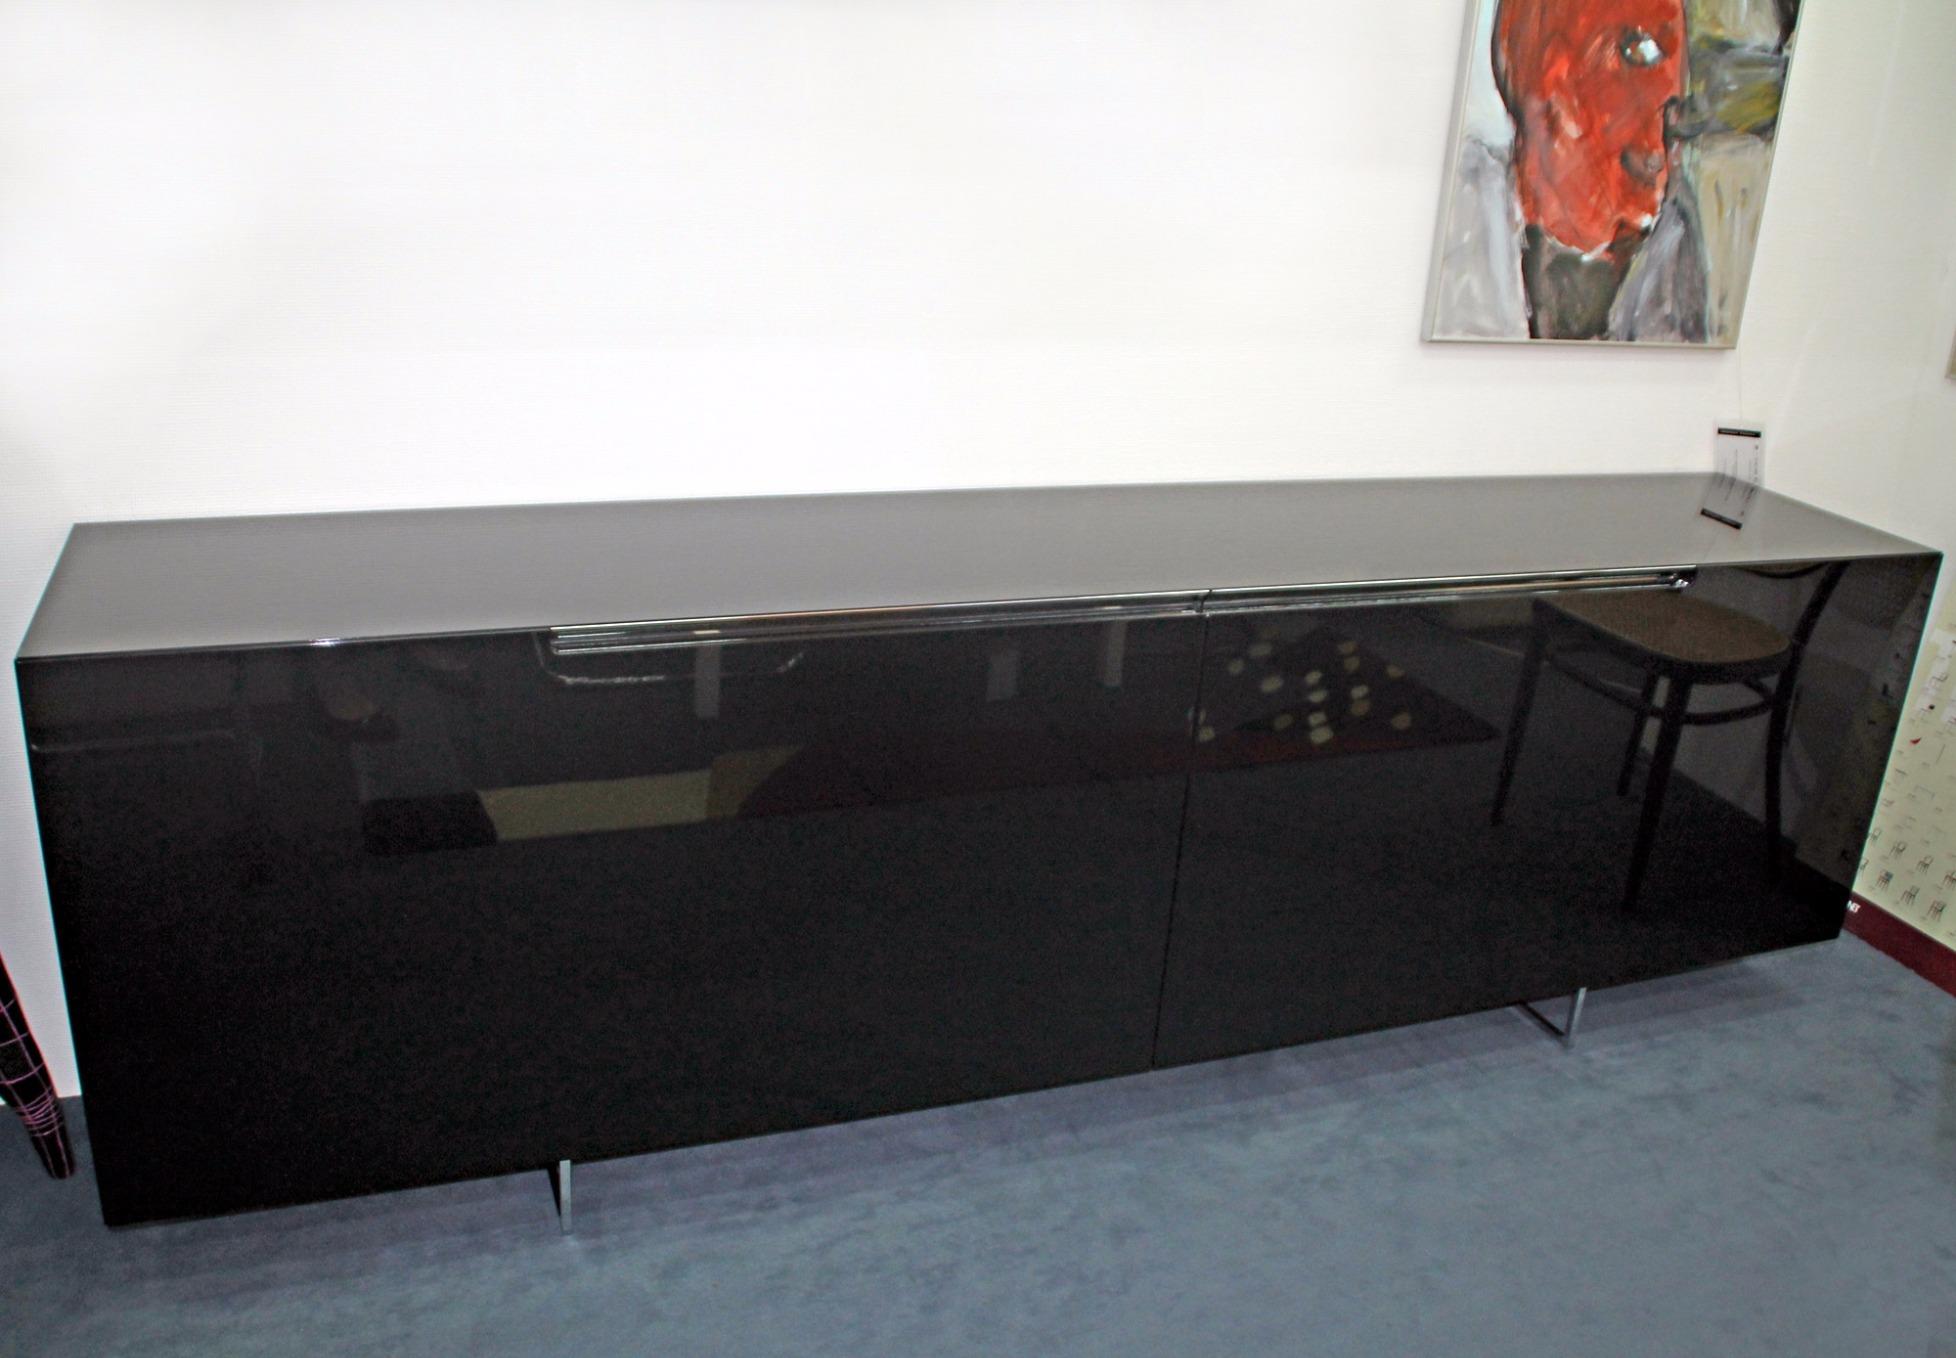 mell cabinet series by interl bke. Black Bedroom Furniture Sets. Home Design Ideas